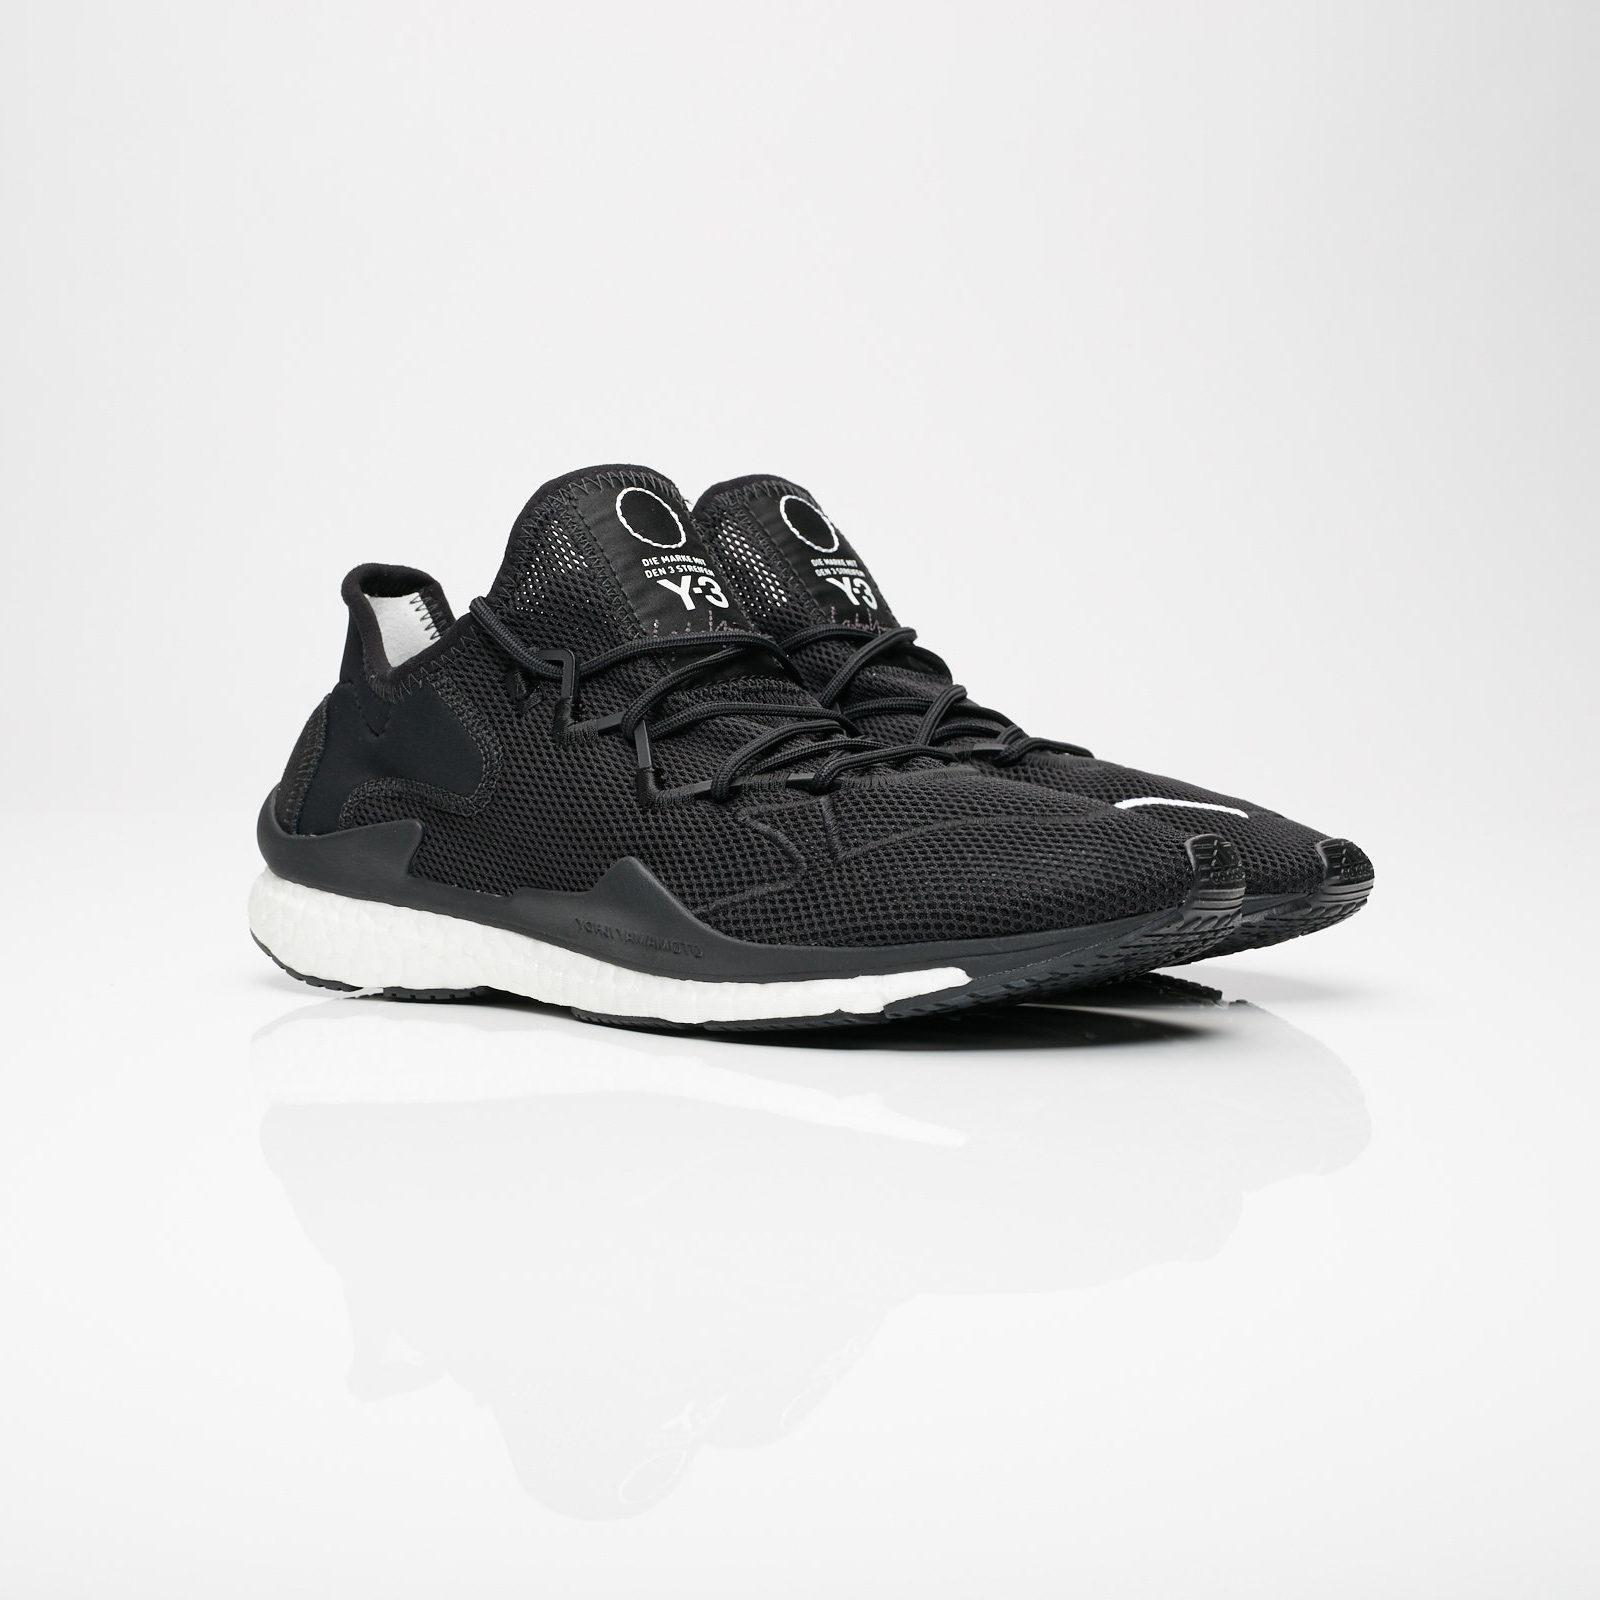 adidas Y-3 Adizero Runner - D97837 - Sneakersnstuff  be621a6fc